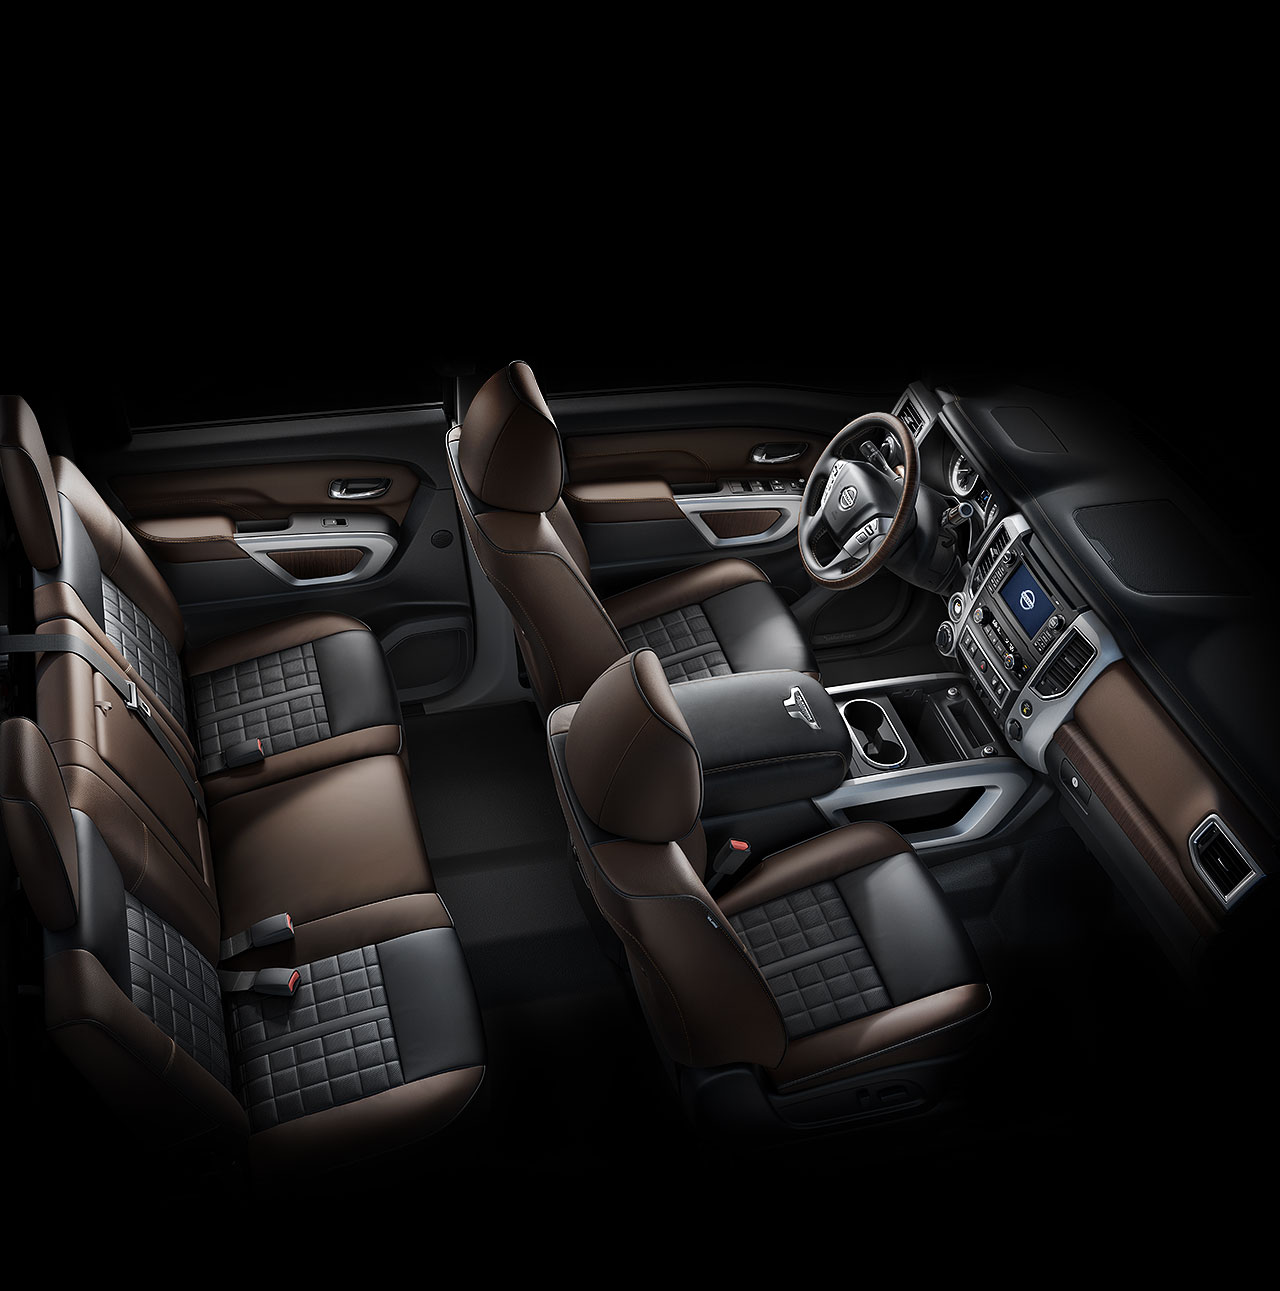 all-new-nissan-titan-xd-2016-aerial-interior-view-13